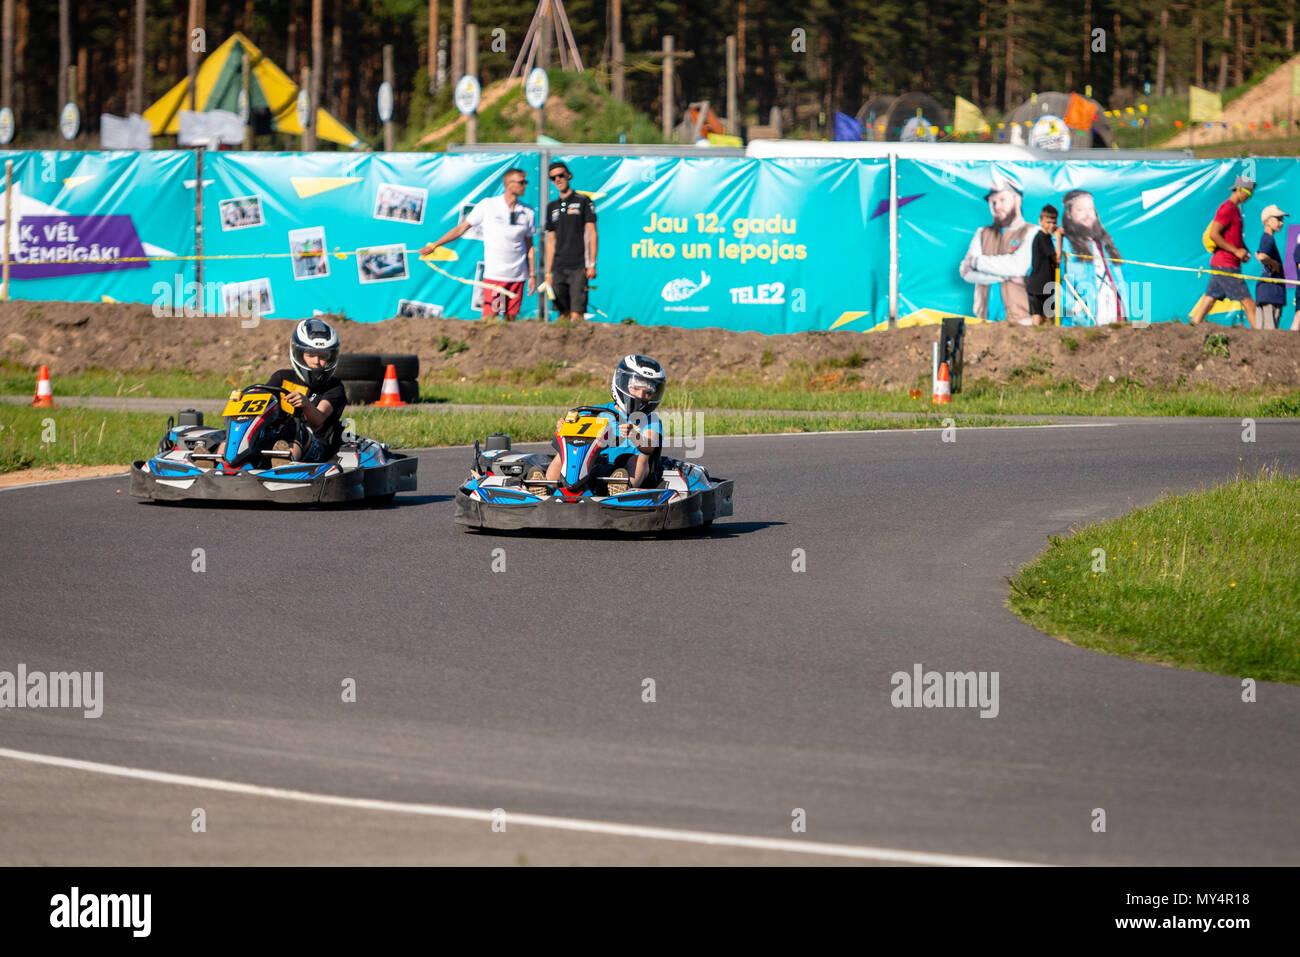 Go Kart Racing On Circuit Stock Photos & Go Kart Racing On